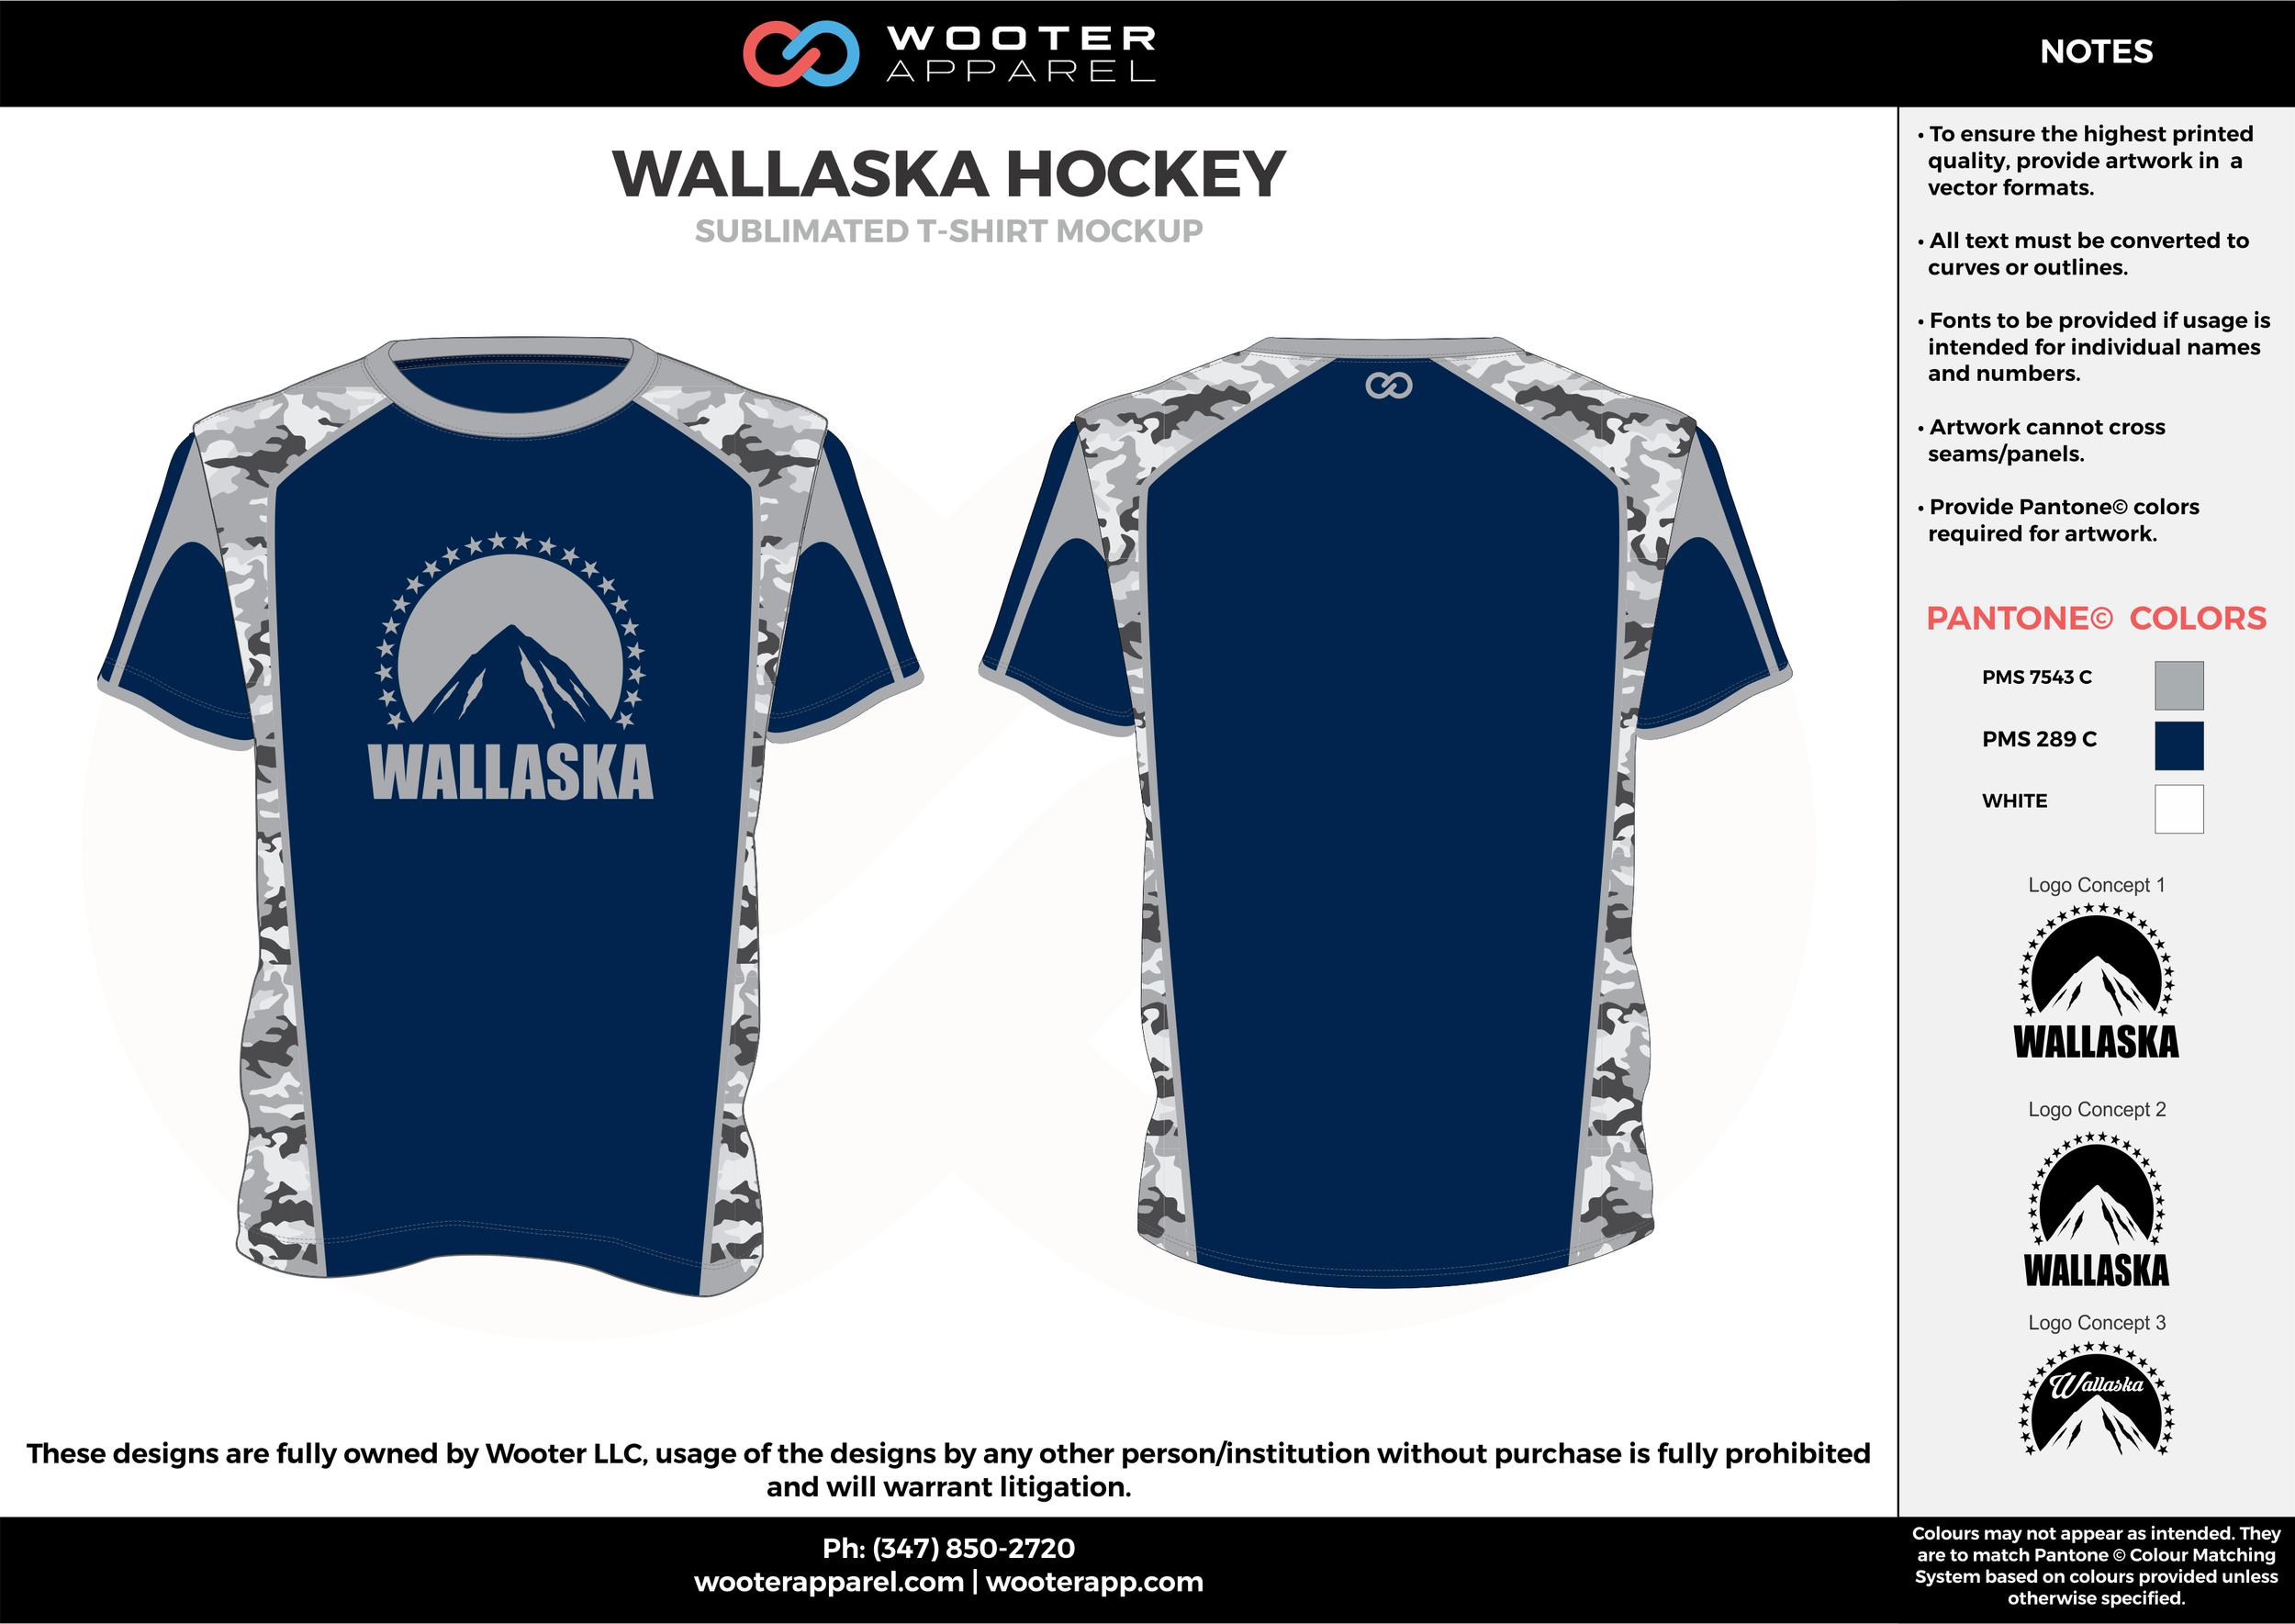 WALLASKA HOCKEY blue gray white custom design t-shirts